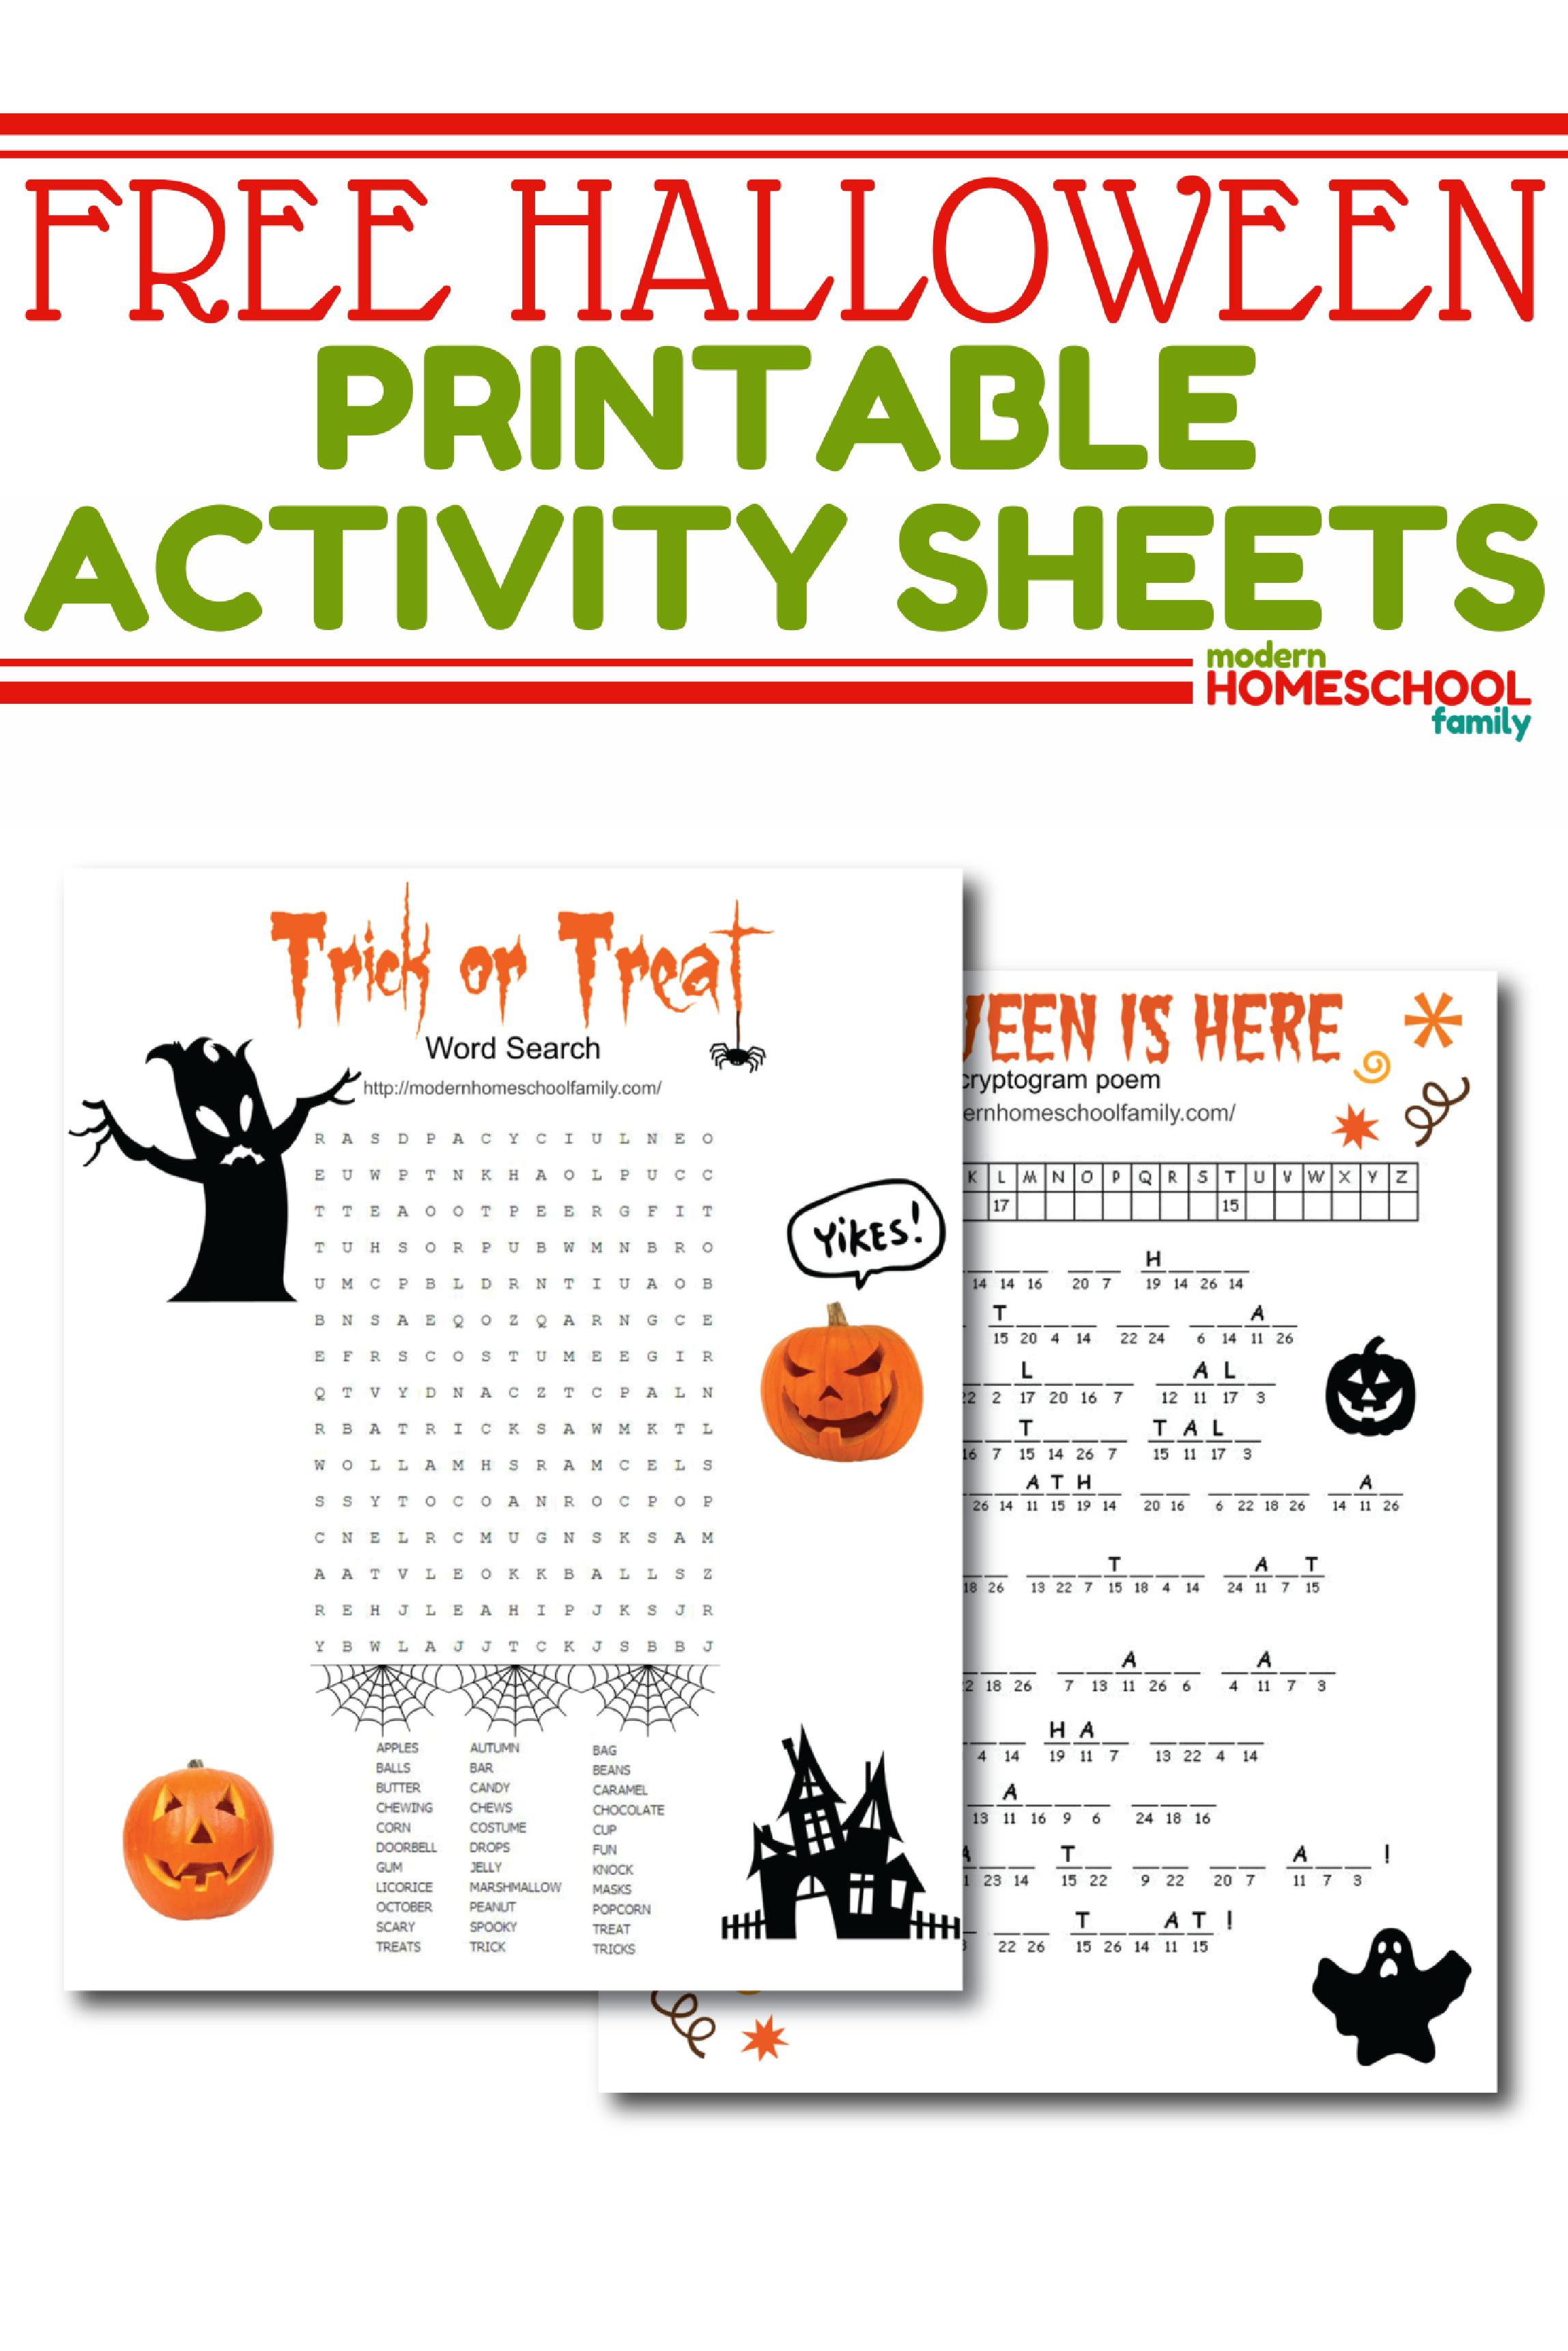 free-halloween-printable-activity-sheets-pinterest | Homeschool ...